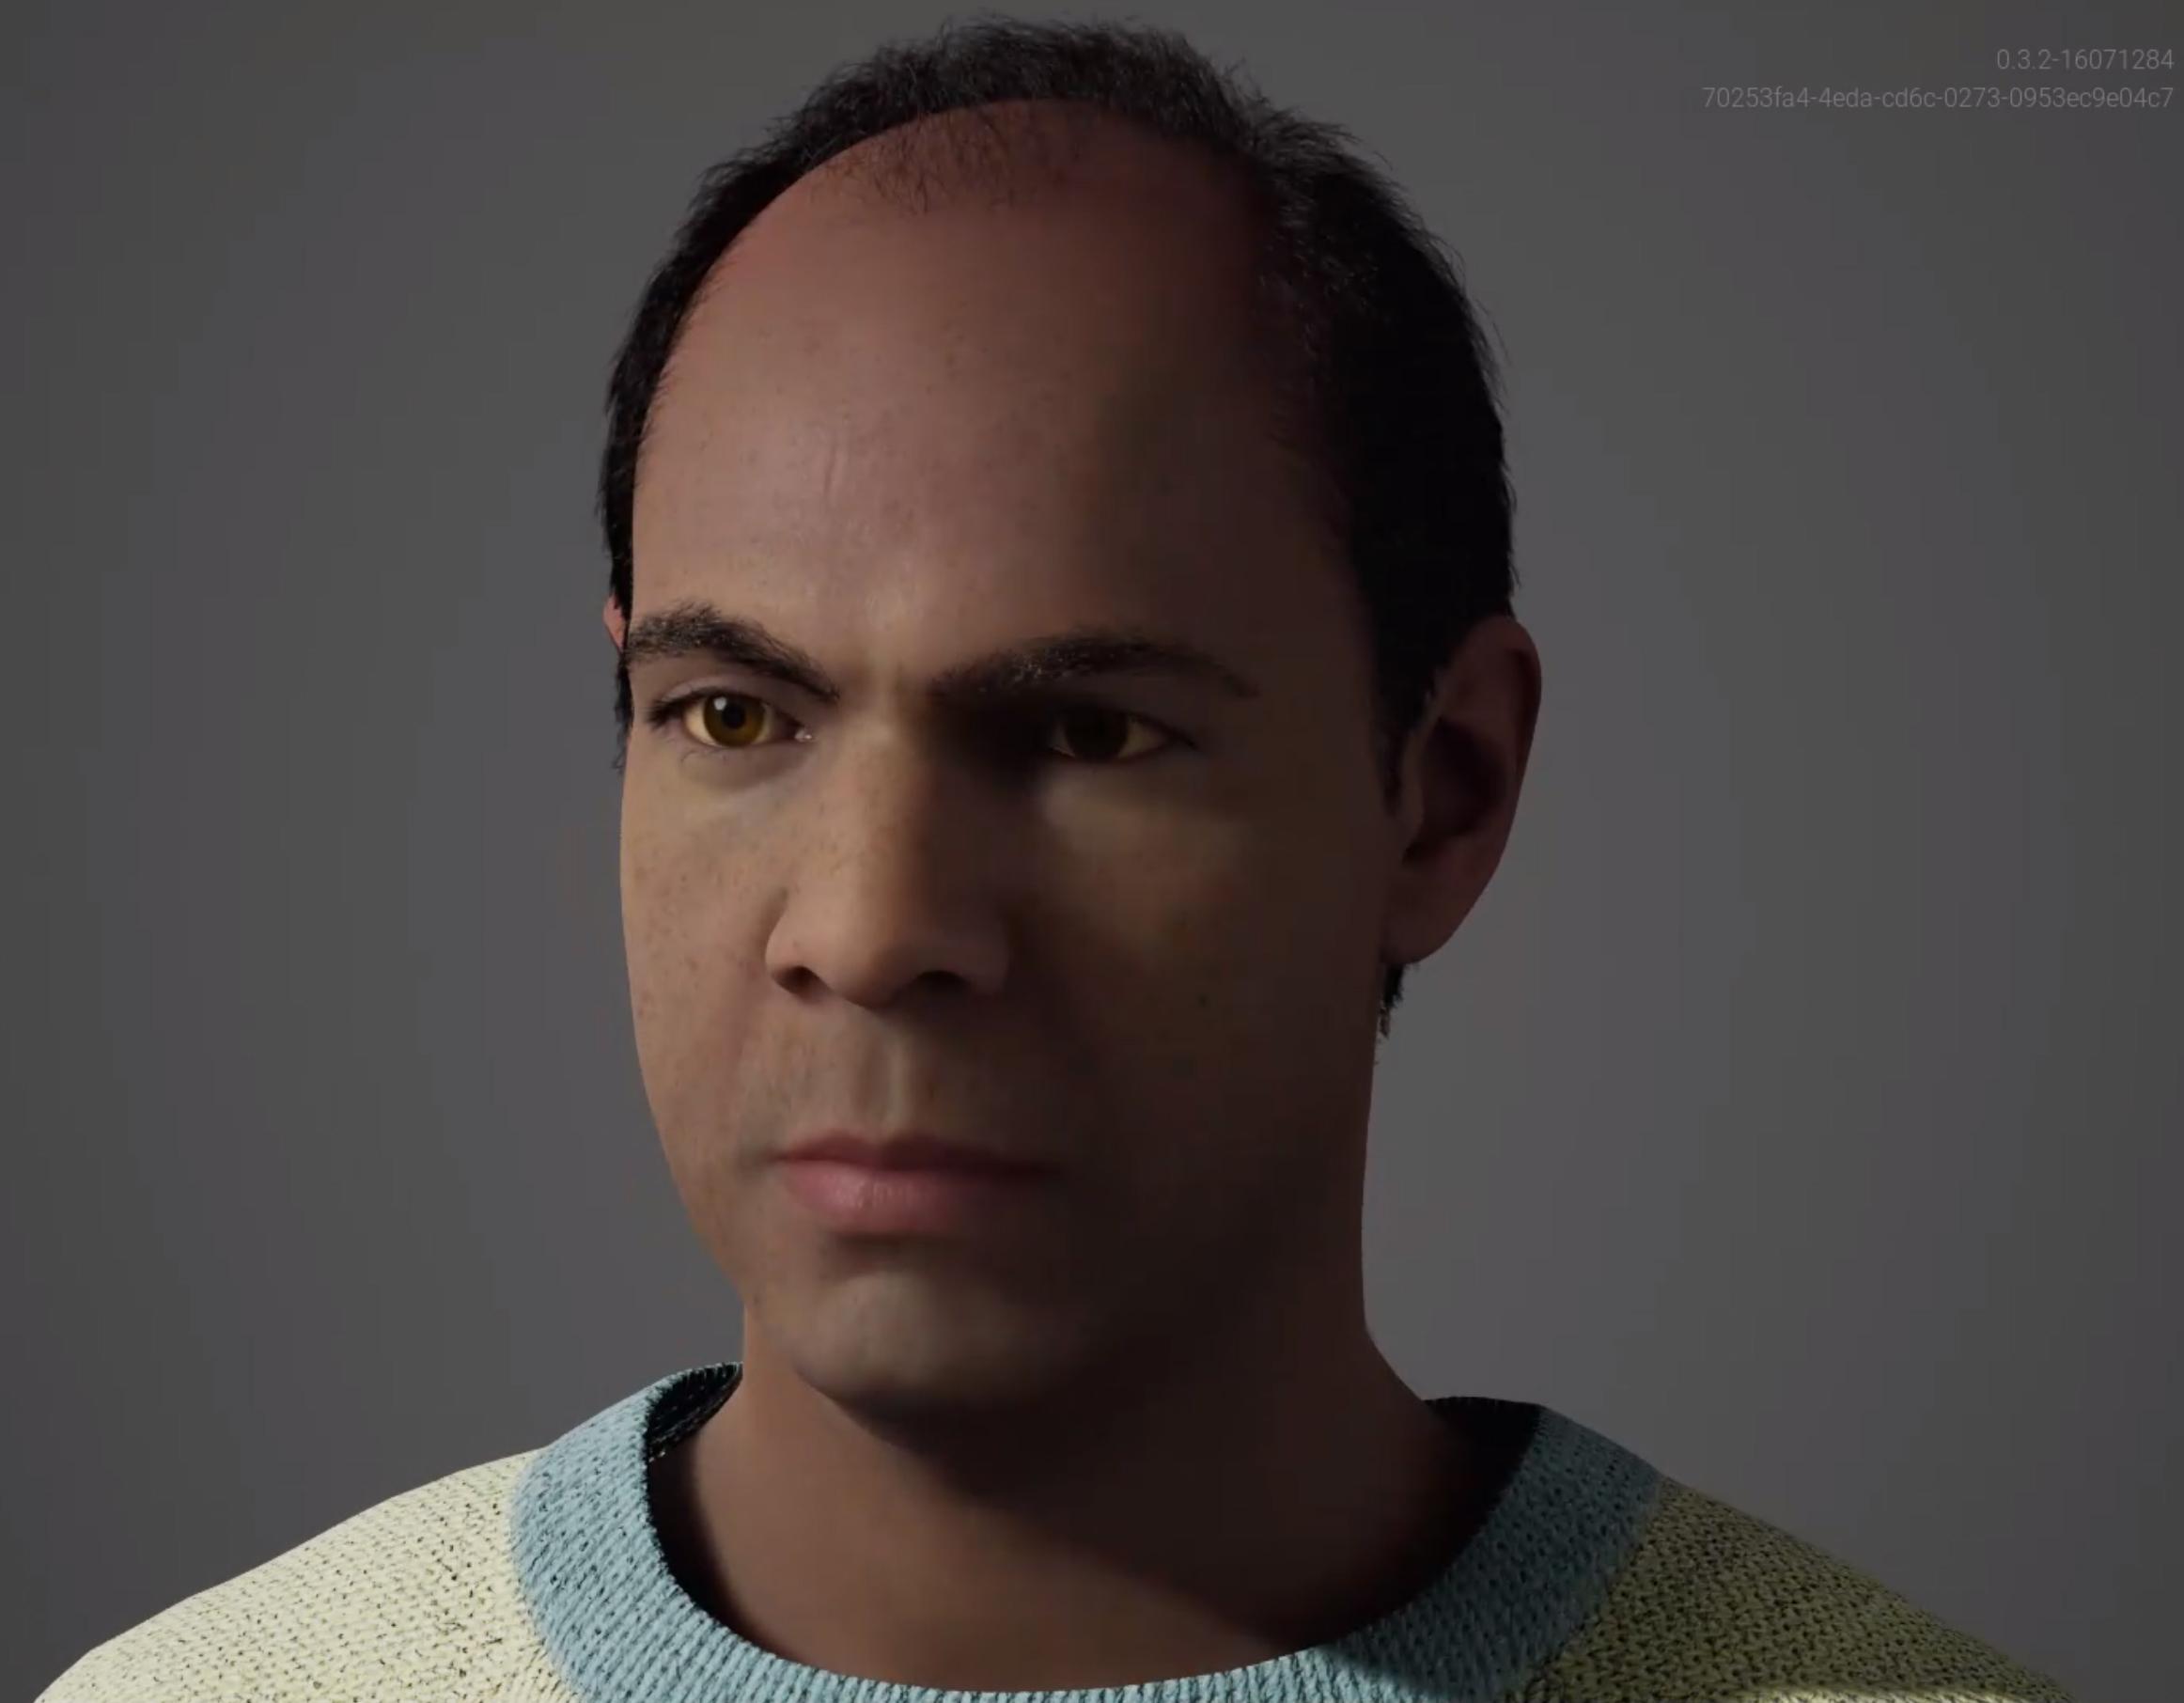 This is Jose a MetaHuman created with the Unreal Engine Metahuman Creator